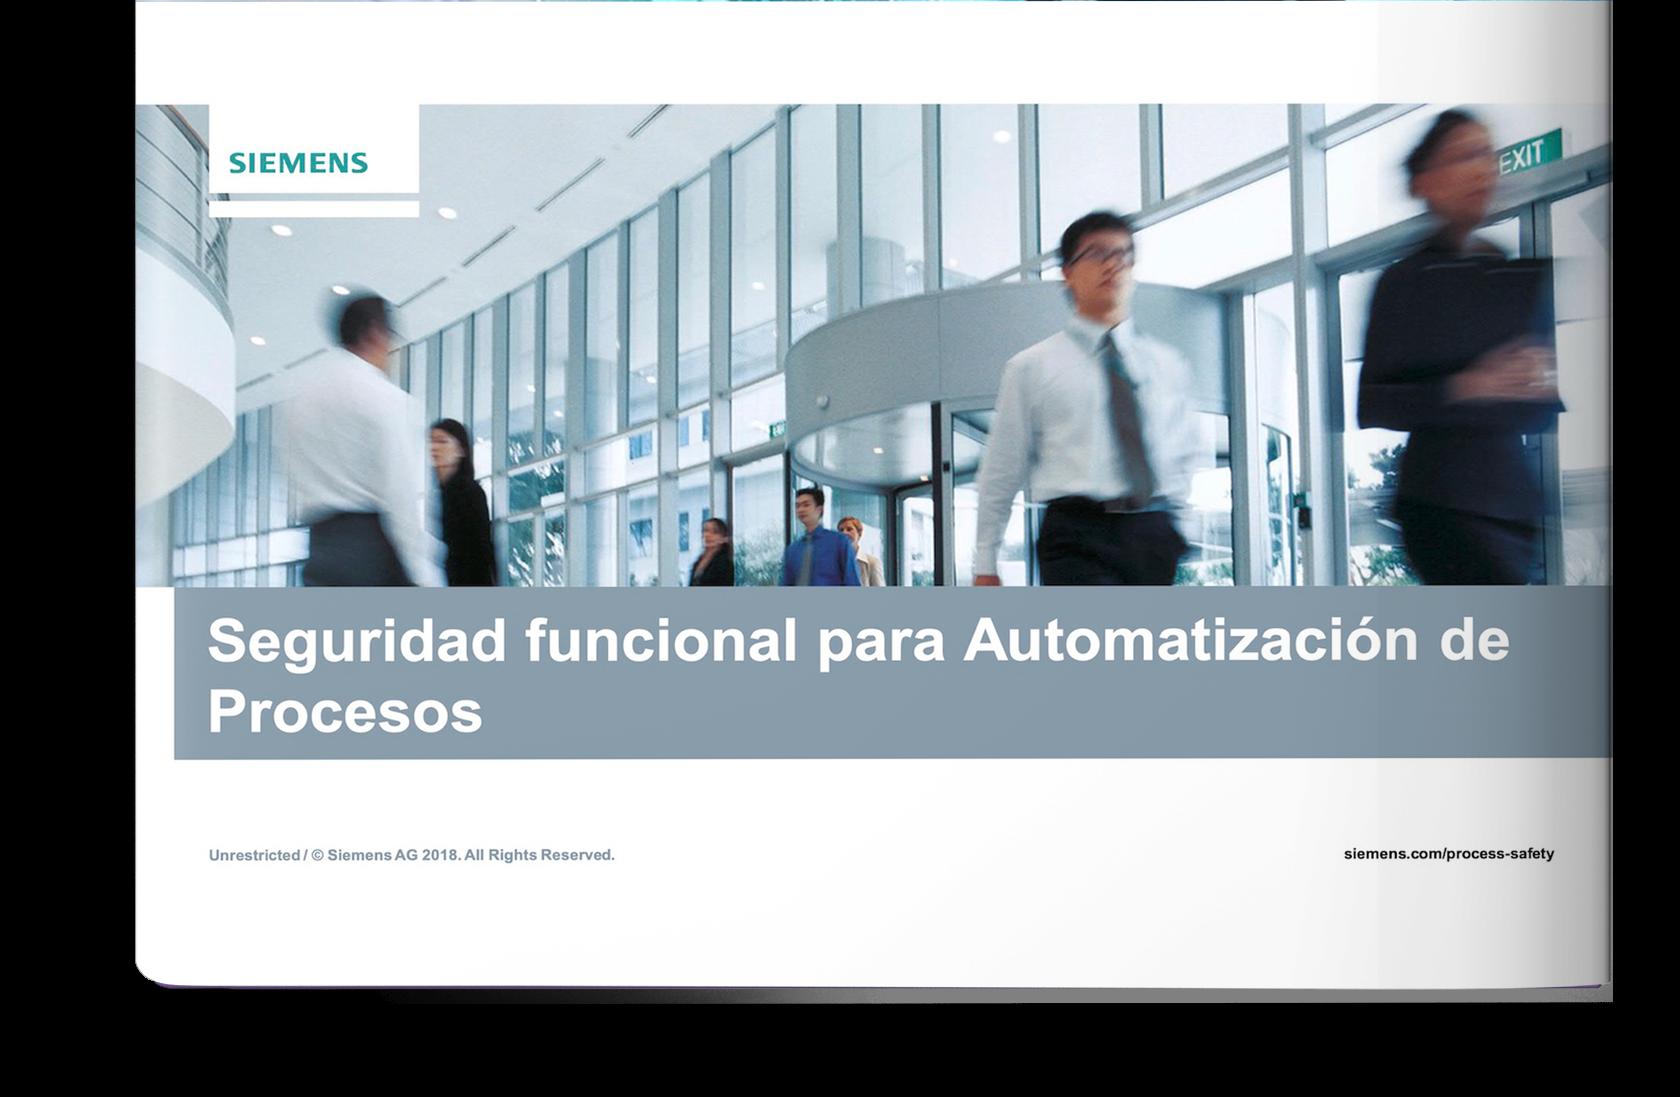 ELICO GROUP. Seguridad integrada para Automatizacion de procesos